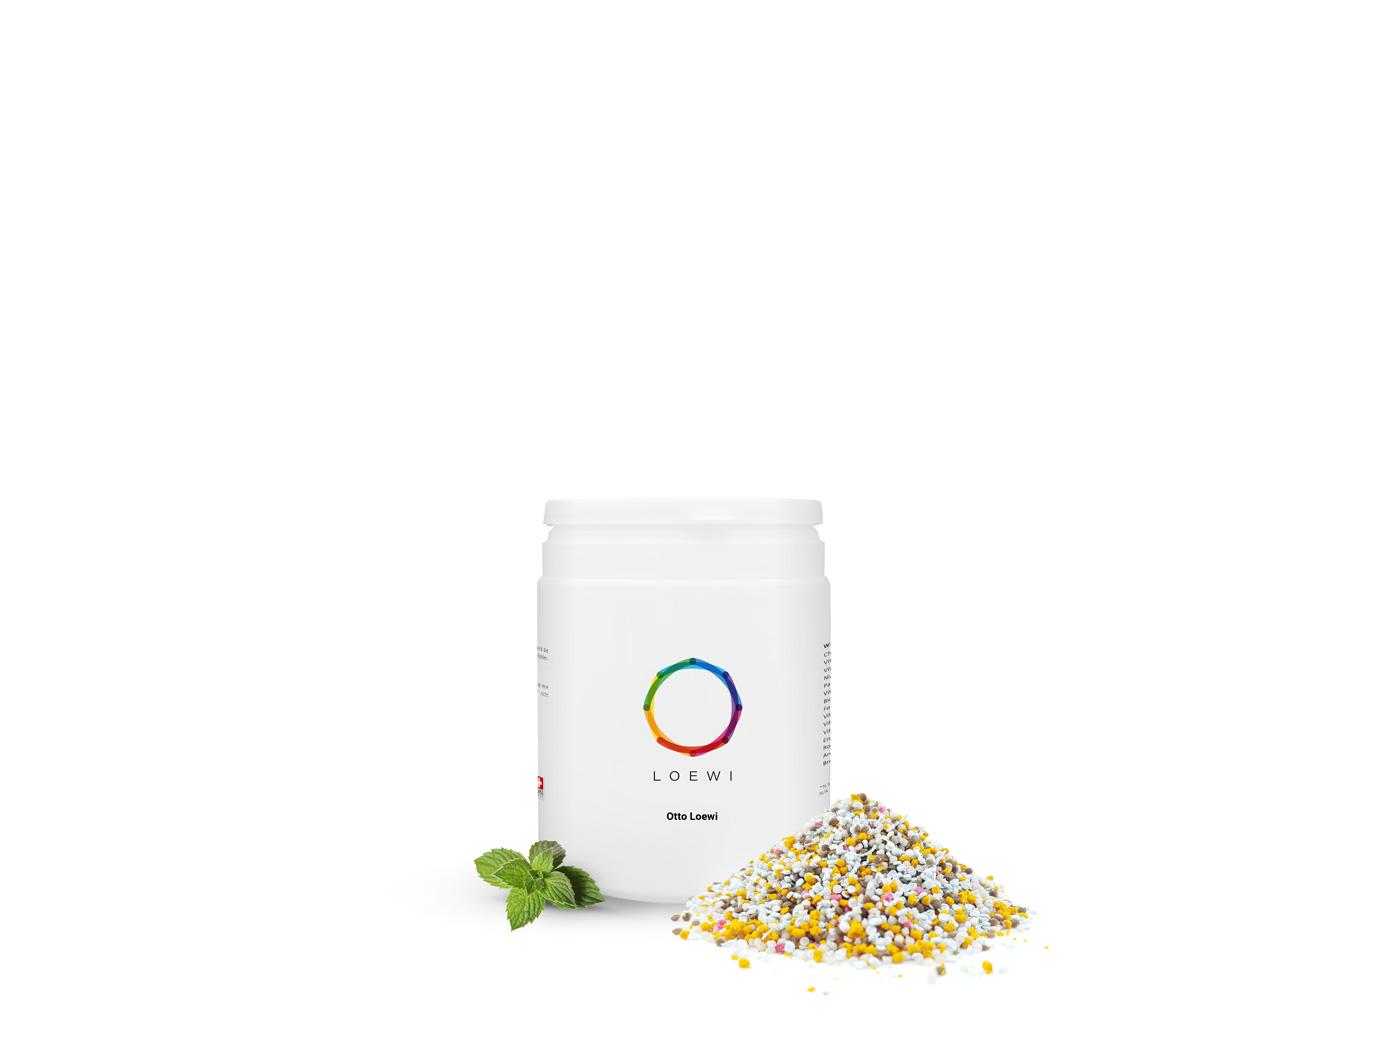 LOEWI_Produkt_Naehrstoffe_2